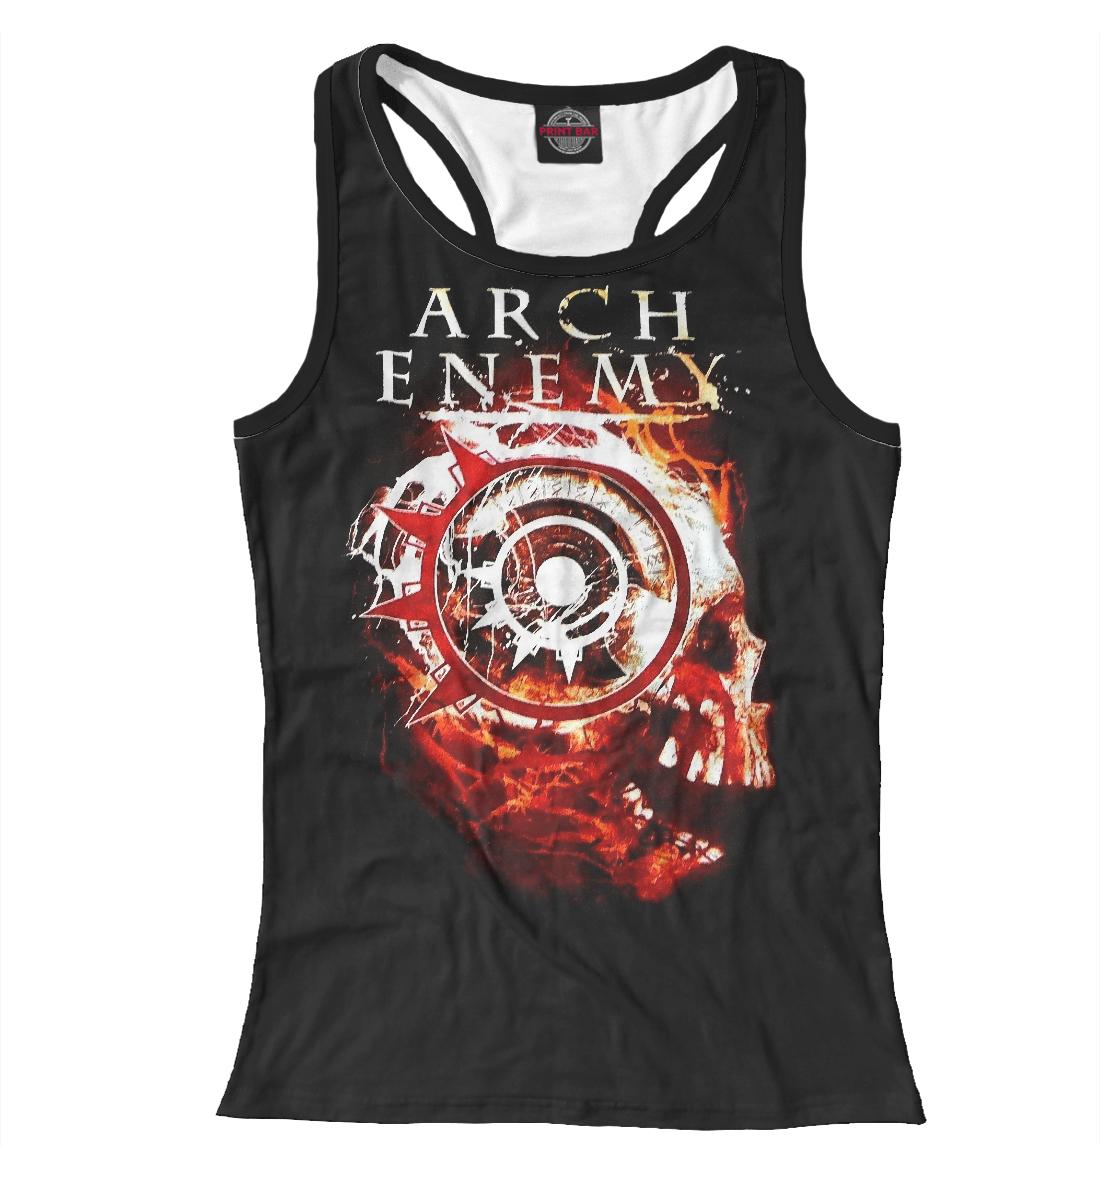 Купить Arch Enemy, Printbar, Майки борцовки, AEN-177937-mayb-1